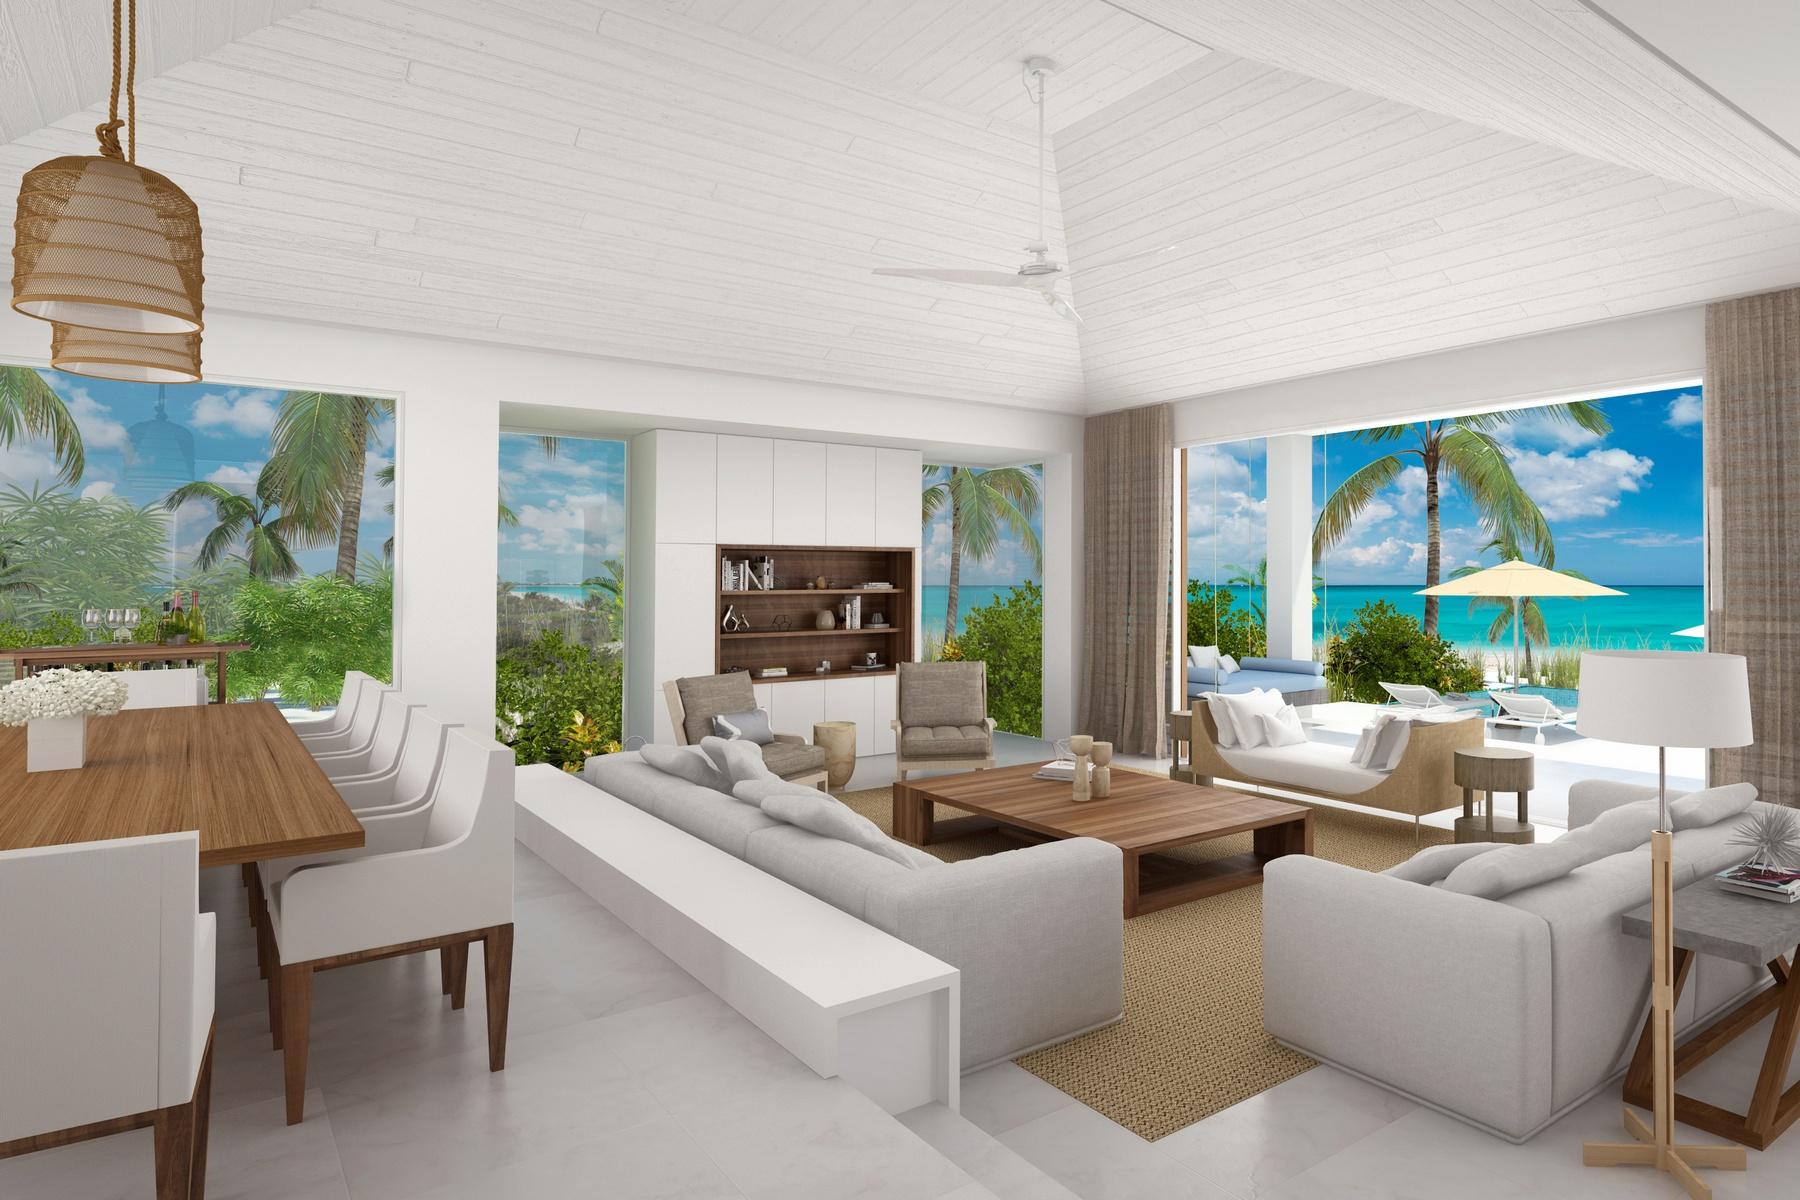 Additional photo for property listing at BEACH ENCLAVE GRACE BAY Design A Oceanview 格蕾斯湾, 普罗维登夏 TCI 特克斯和凯科斯群岛